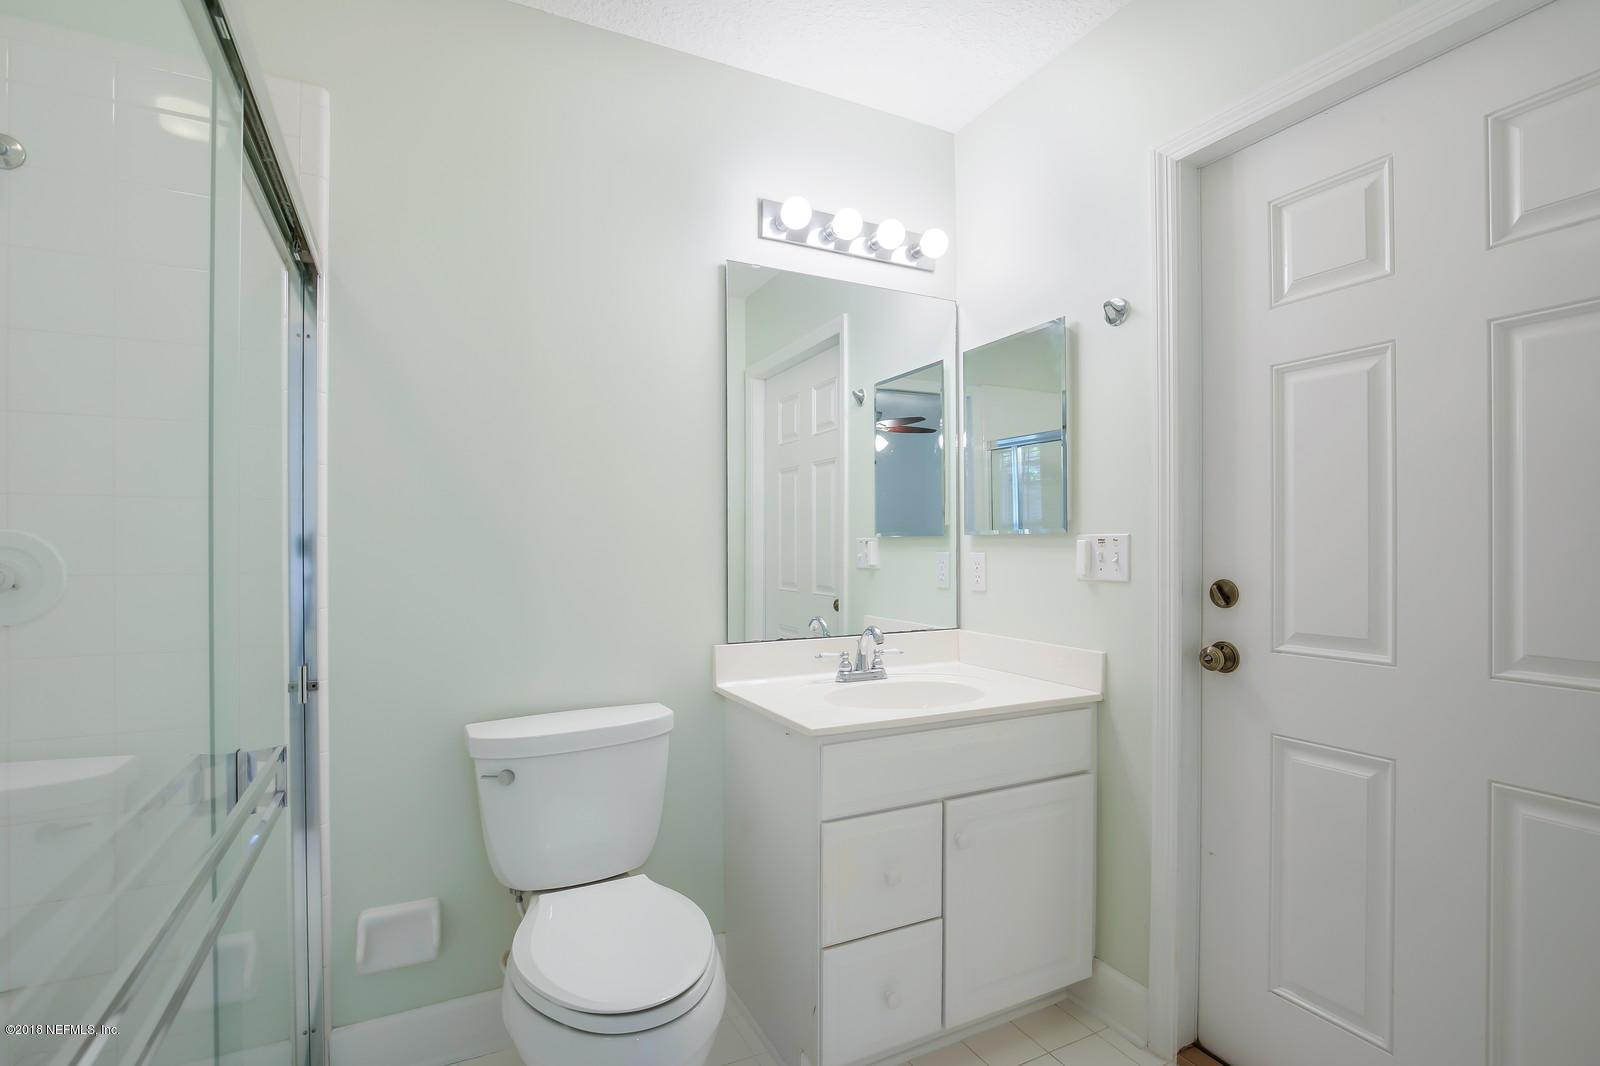 3902 BRAMPTON ISLAND, JACKSONVILLE, FLORIDA 32224, 4 Bedrooms Bedrooms, ,3 BathroomsBathrooms,Residential - single family,For sale,BRAMPTON ISLAND,934759